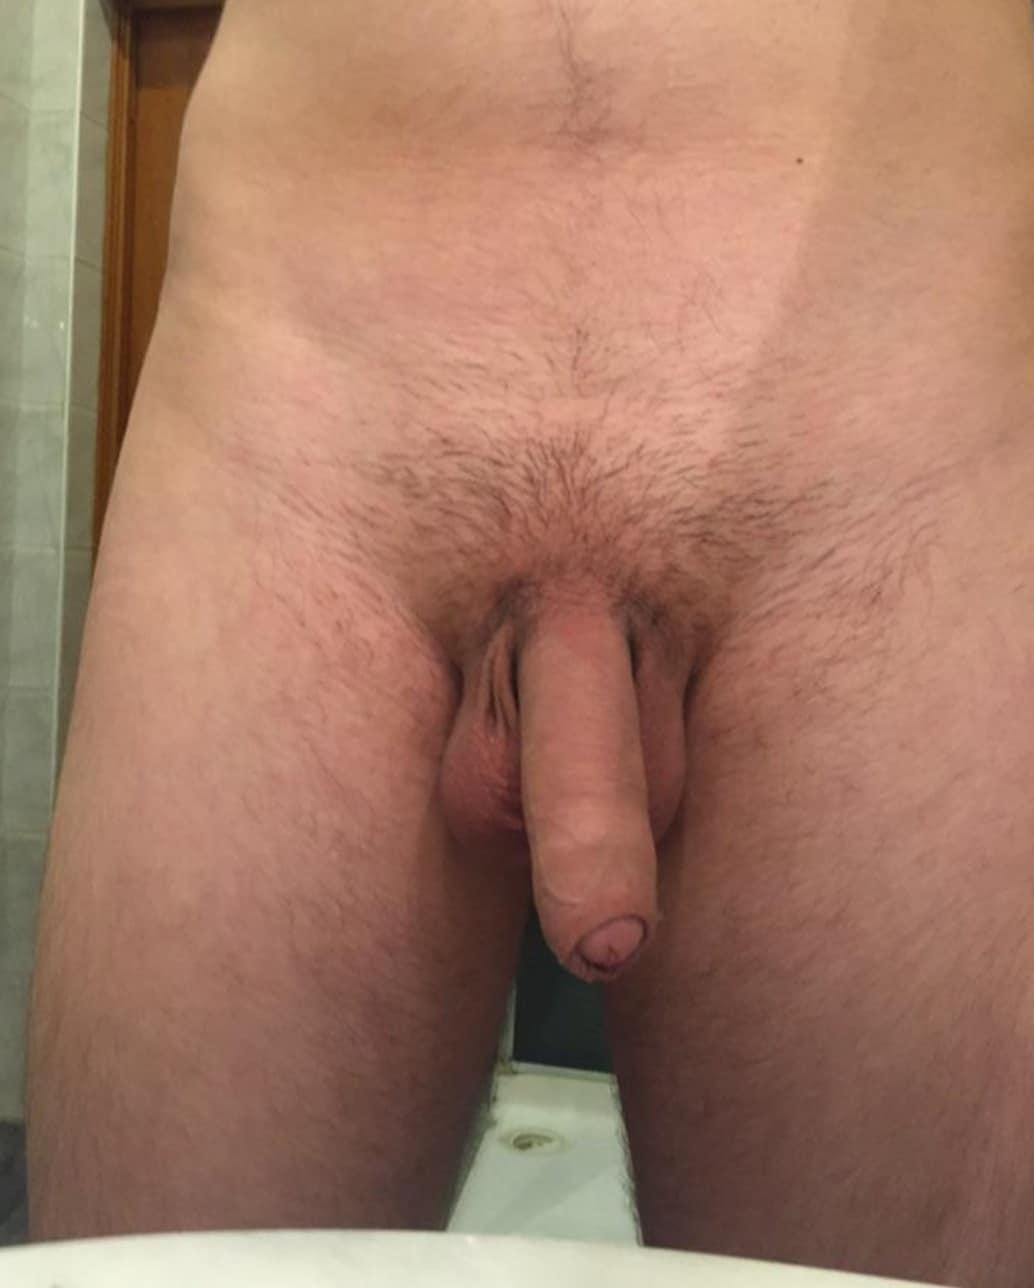 Soft uncut dick picture